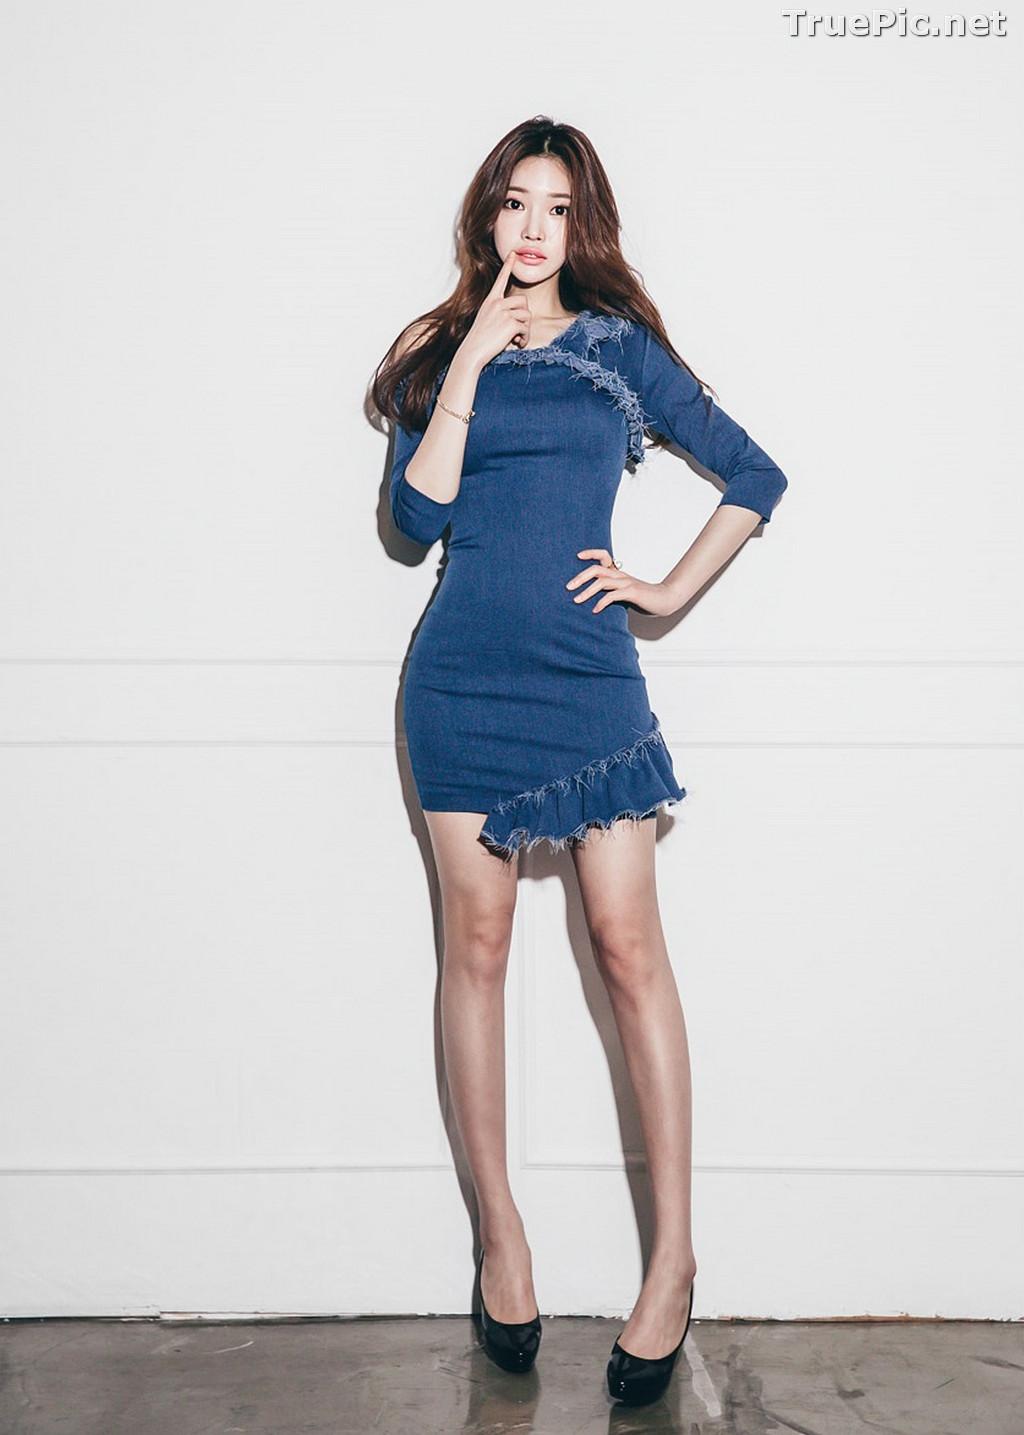 Image Korean Beautiful Model – Park Jung Yoon – Fashion Photography #10 - TruePic.net - Picture-3